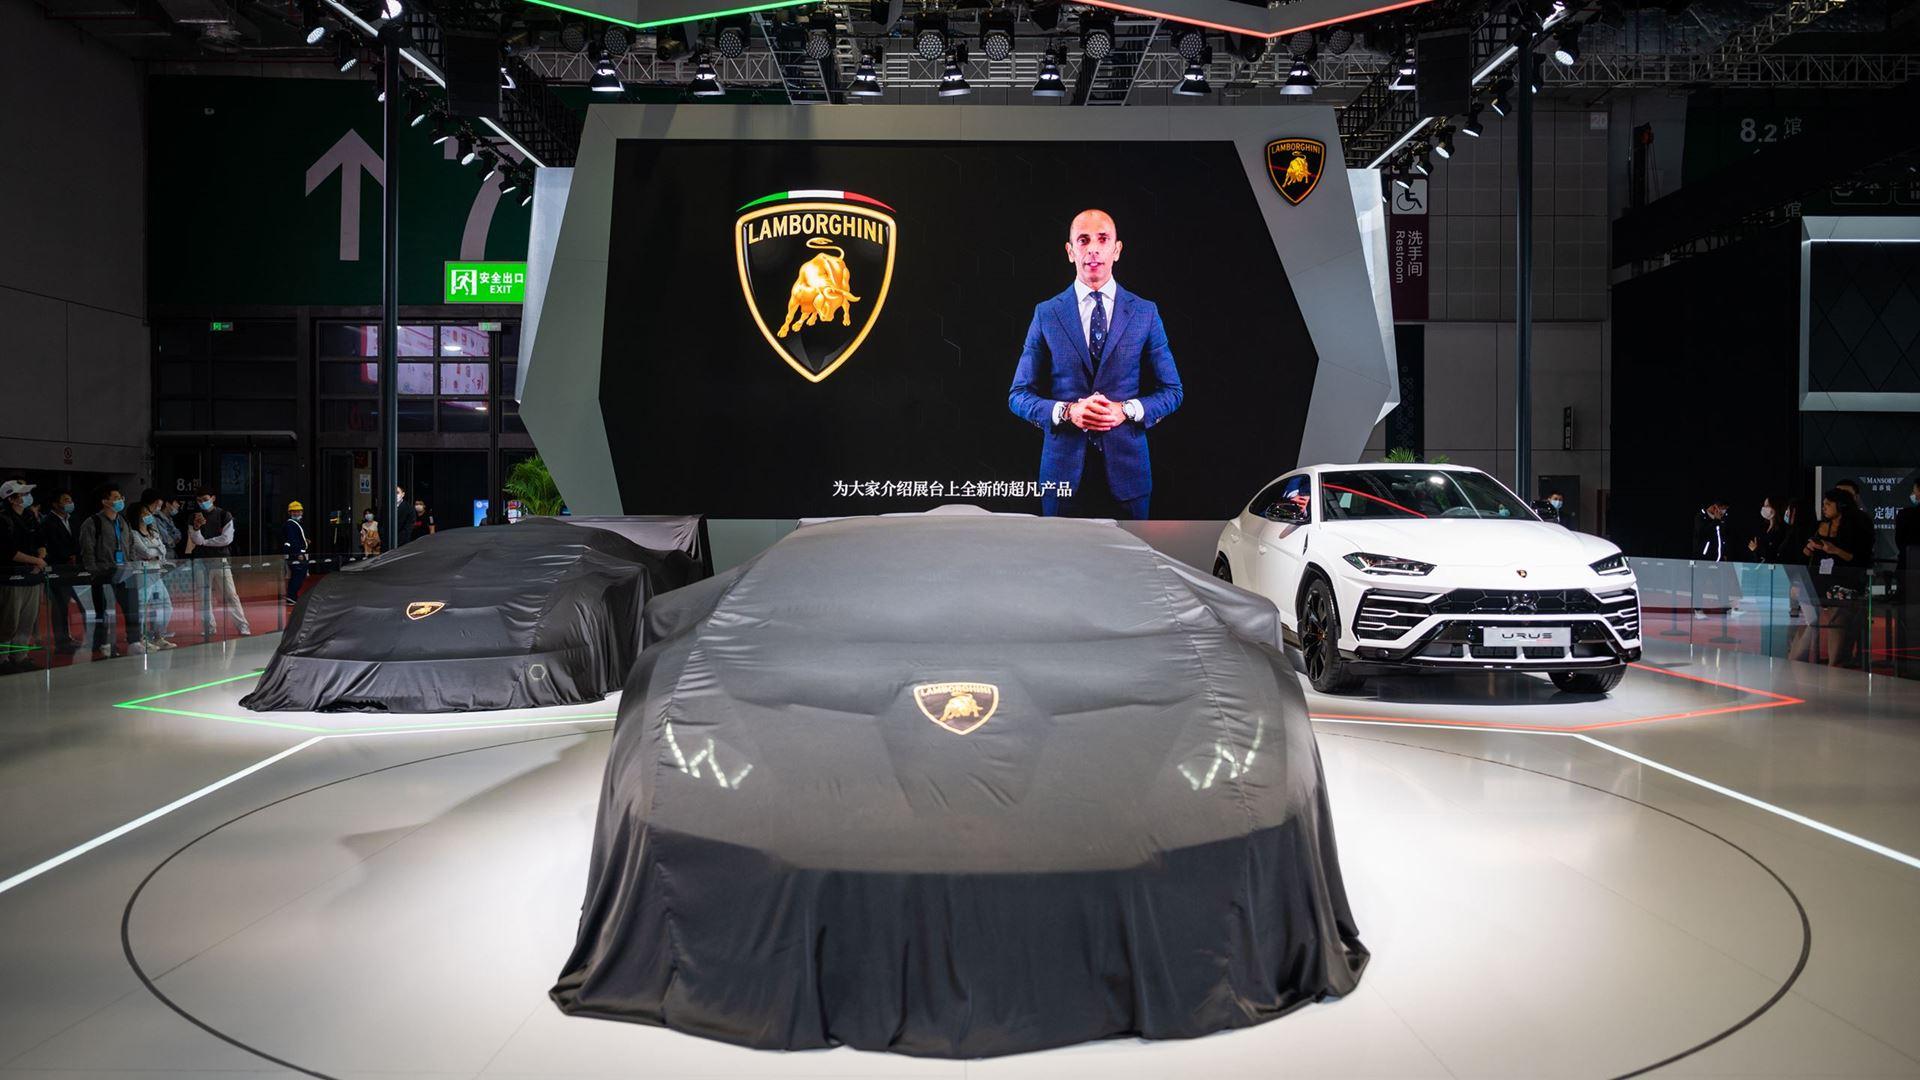 Three premieres for Automobili Lamborghini at the 2021 Shanghai Auto Show - Image 5